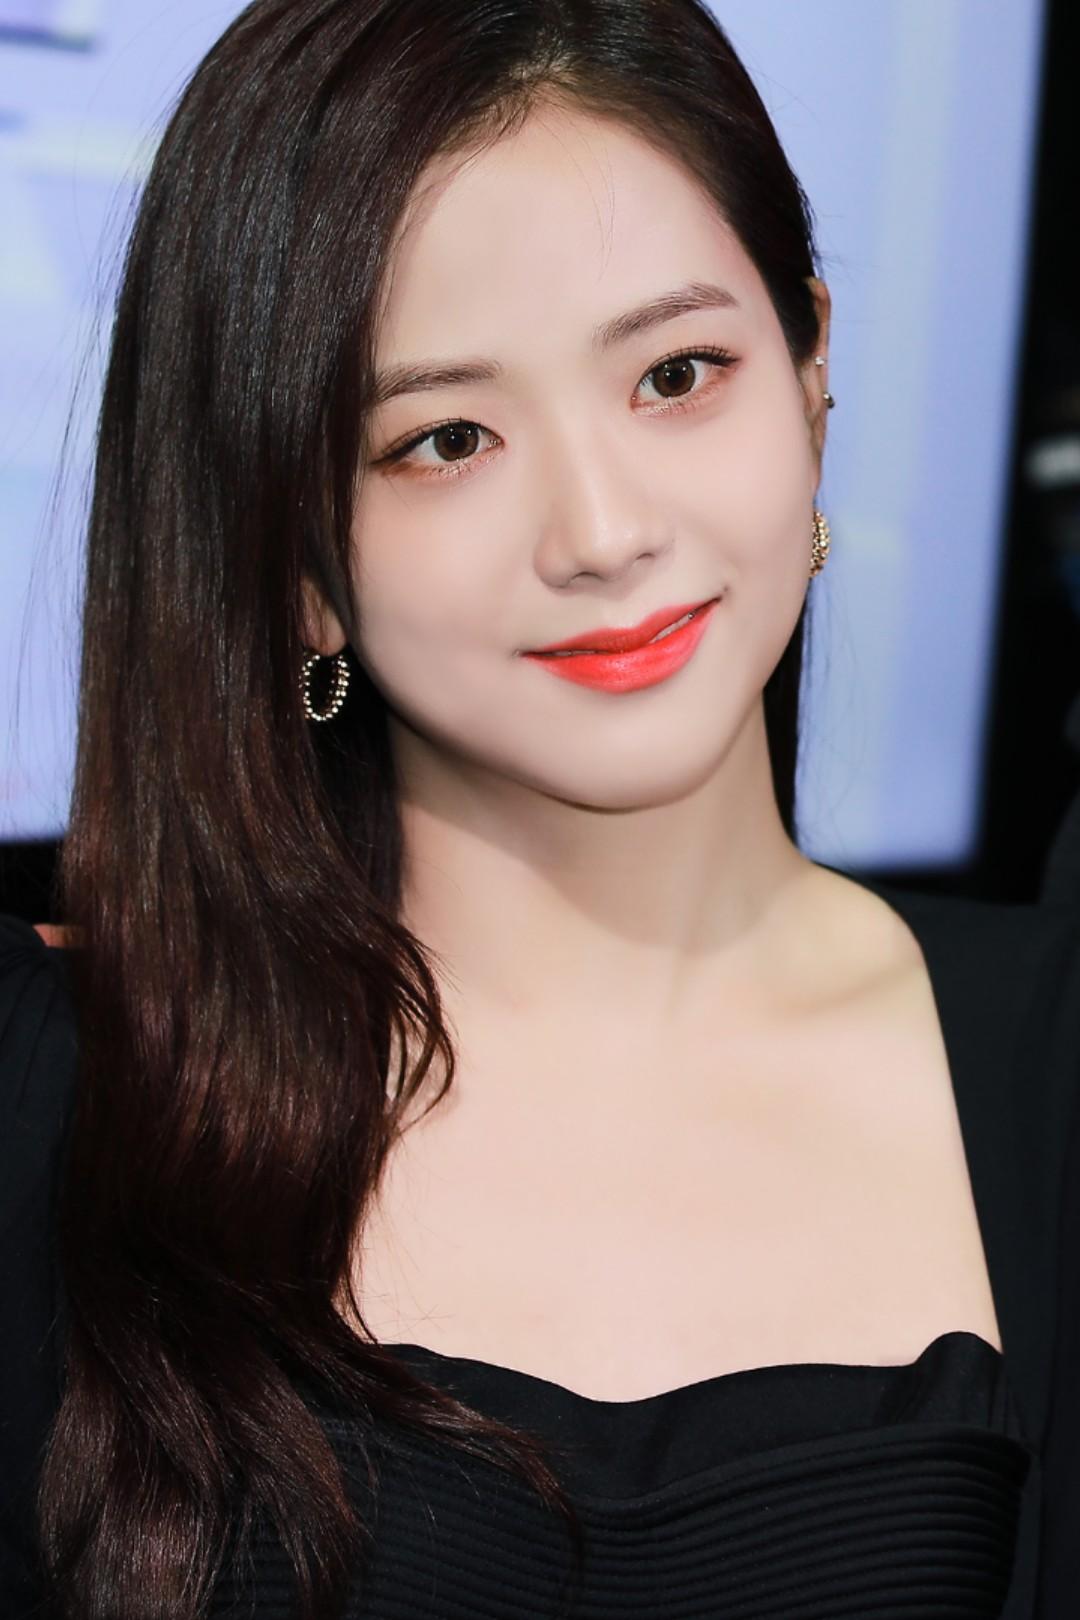 File:Kim Ji-soo at Jimmy Choo Event on January 09, 2020 (4 ...